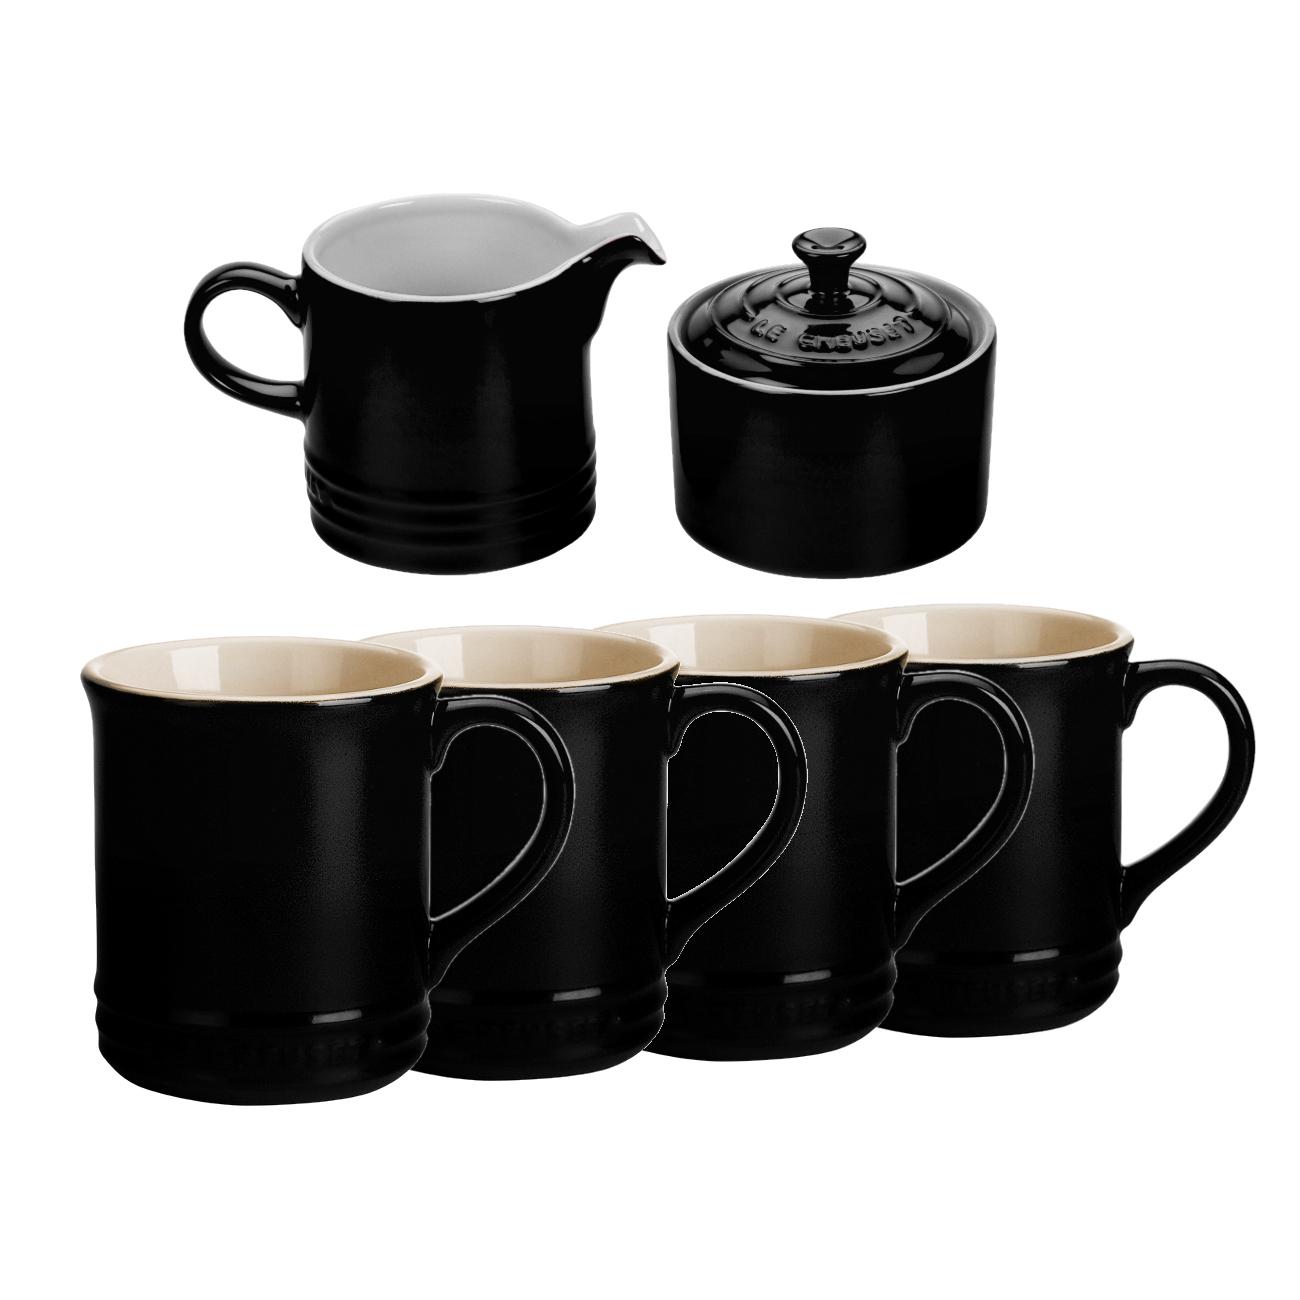 Le Creuset 6 Piece Black Onyx Stoneware Coffee or Tea Service Set With Mugs & Cream & Sugar Set